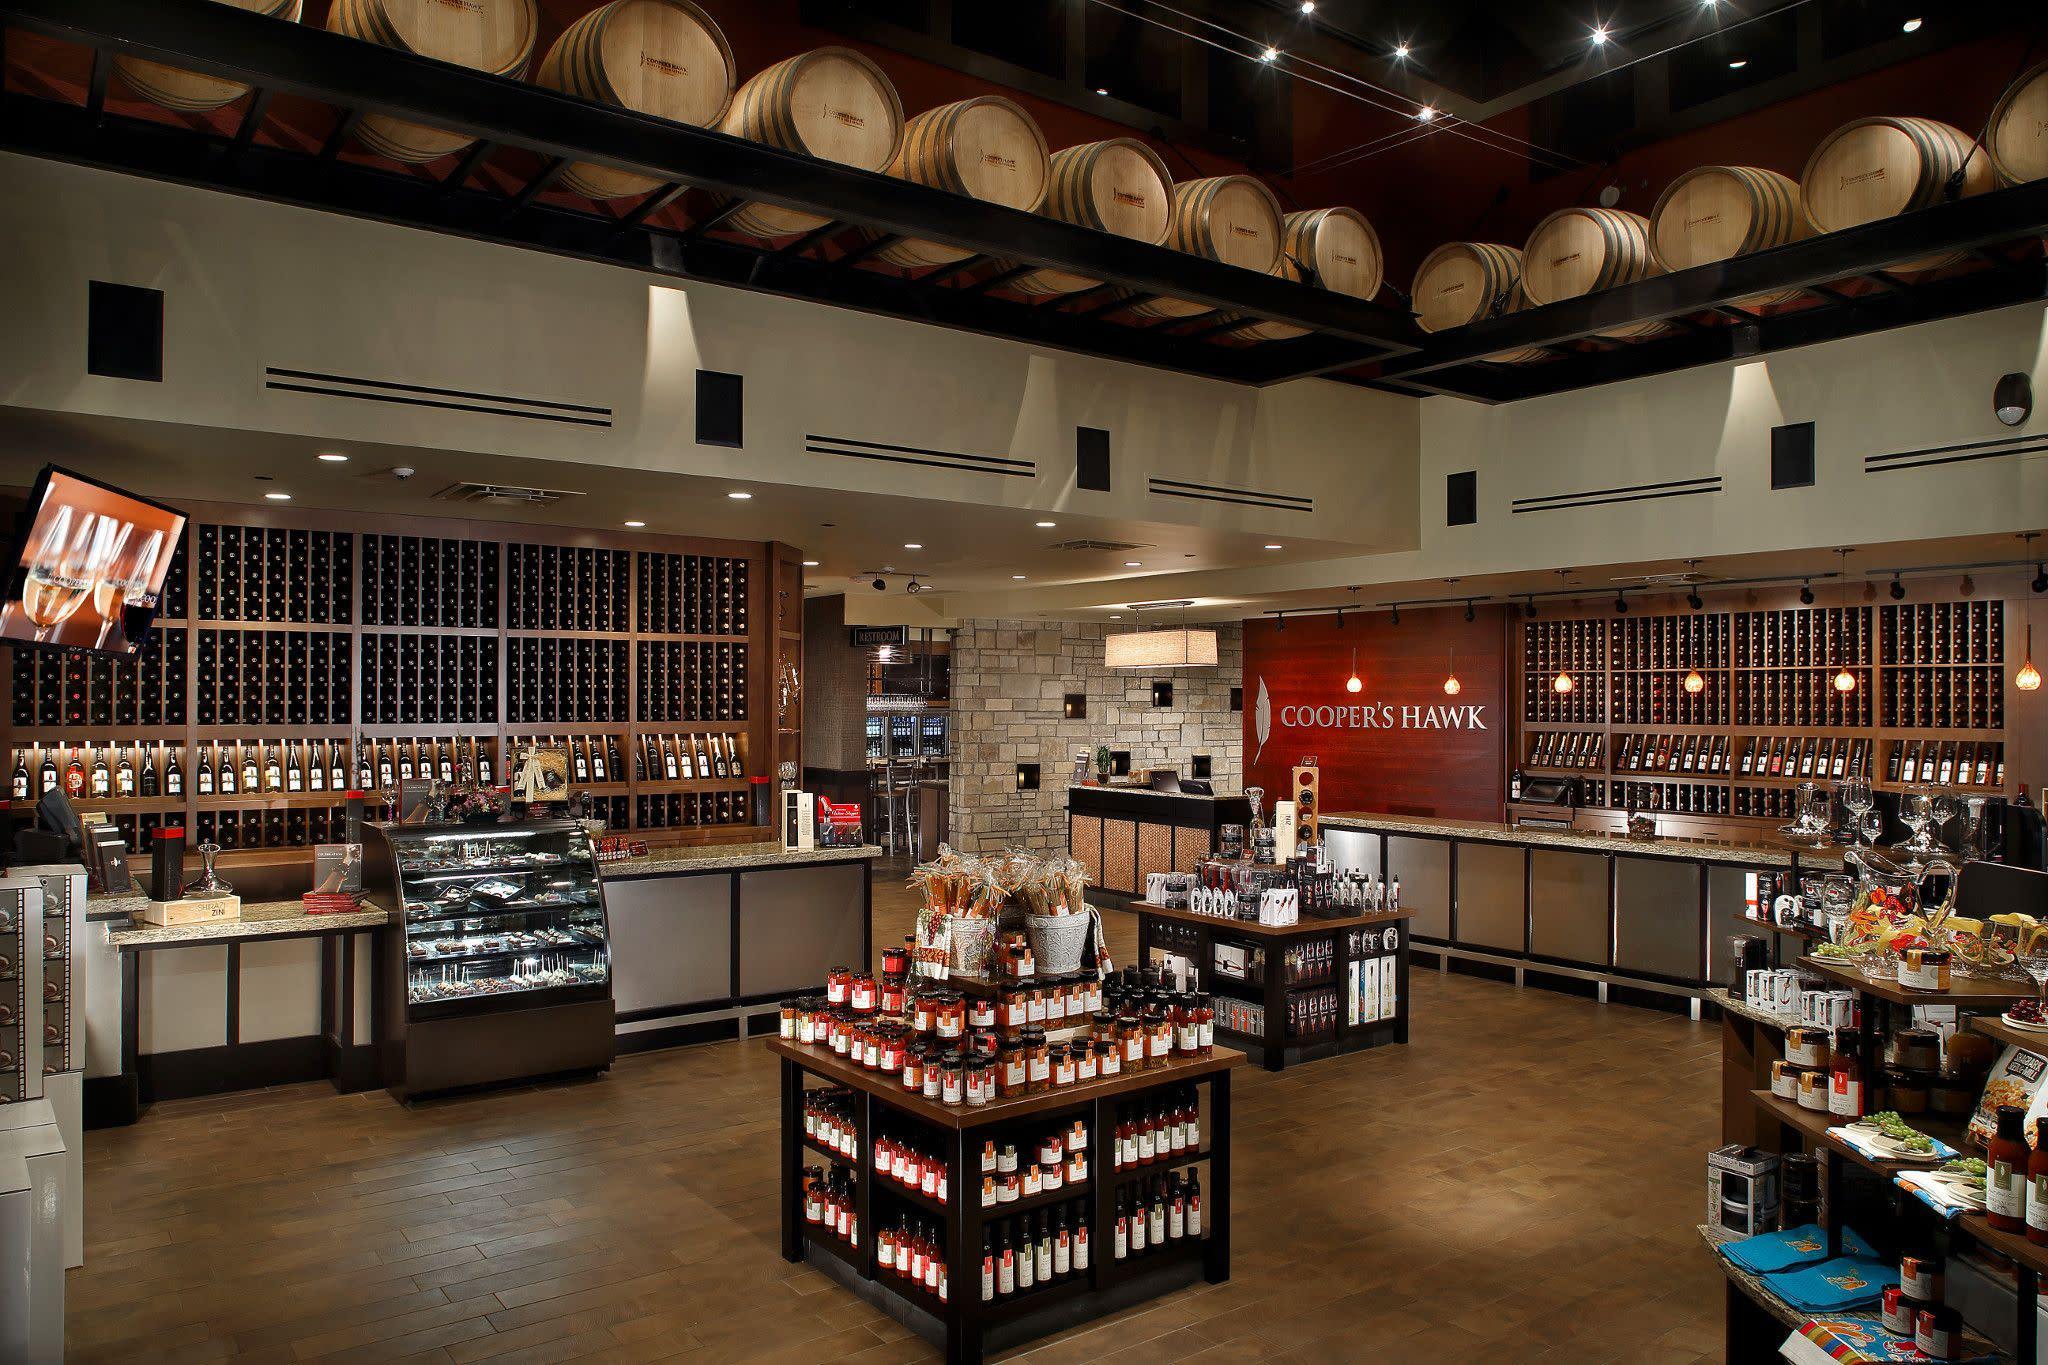 Wine Store at Cooper's Hawk Winery & Restaurant in Orlando